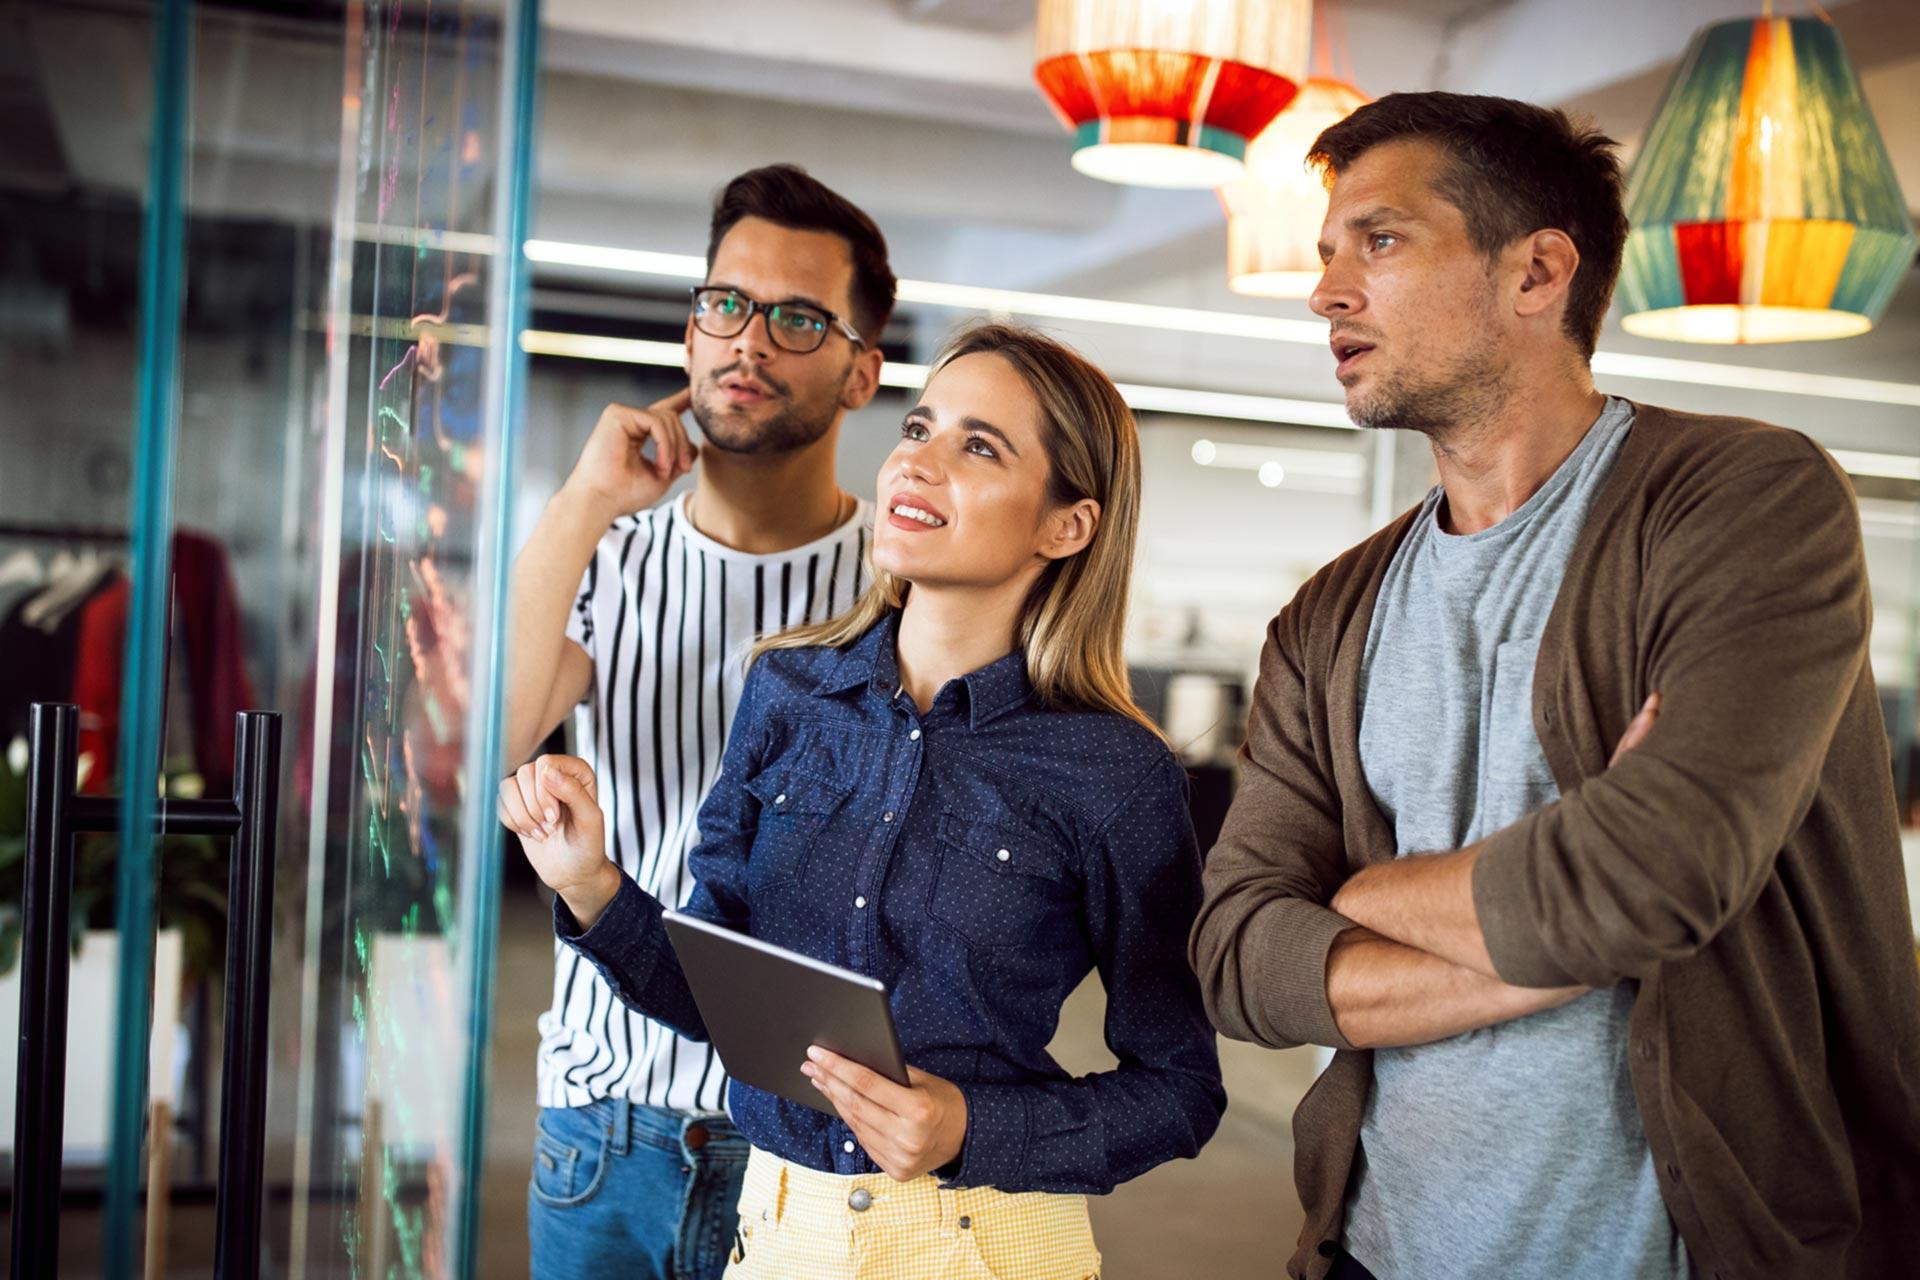 Nonprofit employees brainstorming